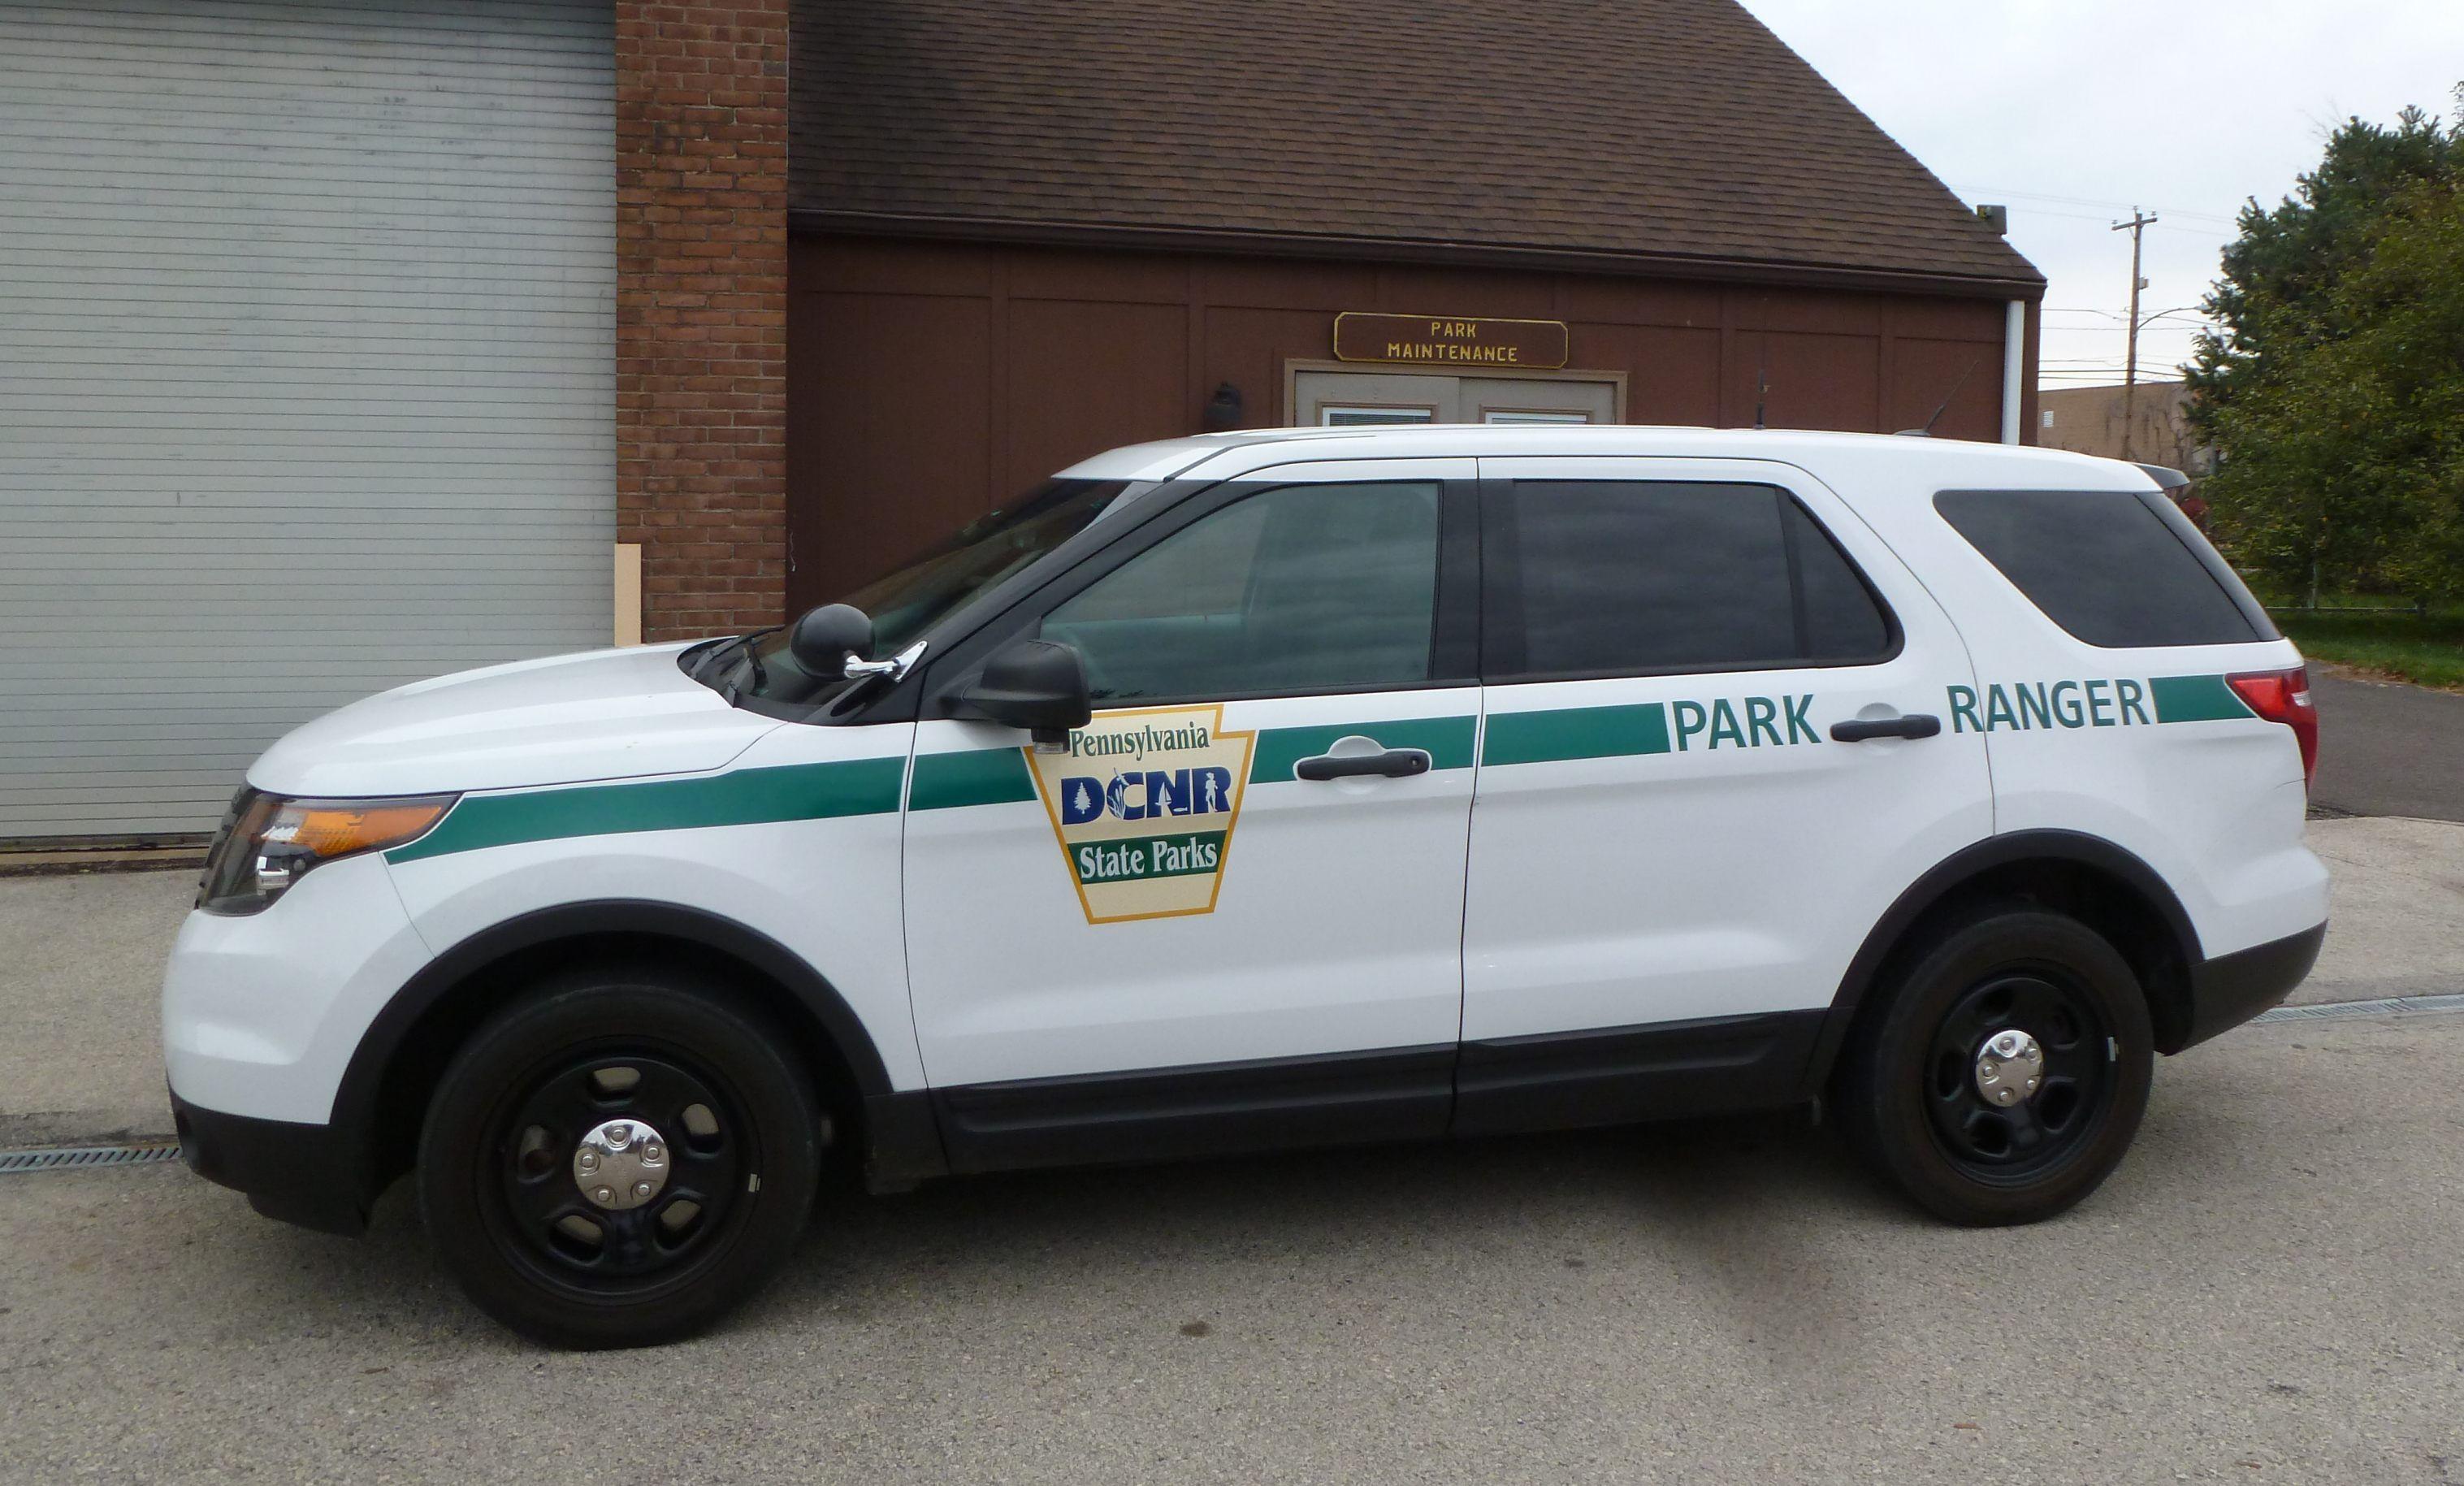 Pennsylvania Pennsylvania State Park Ranger Ford Police